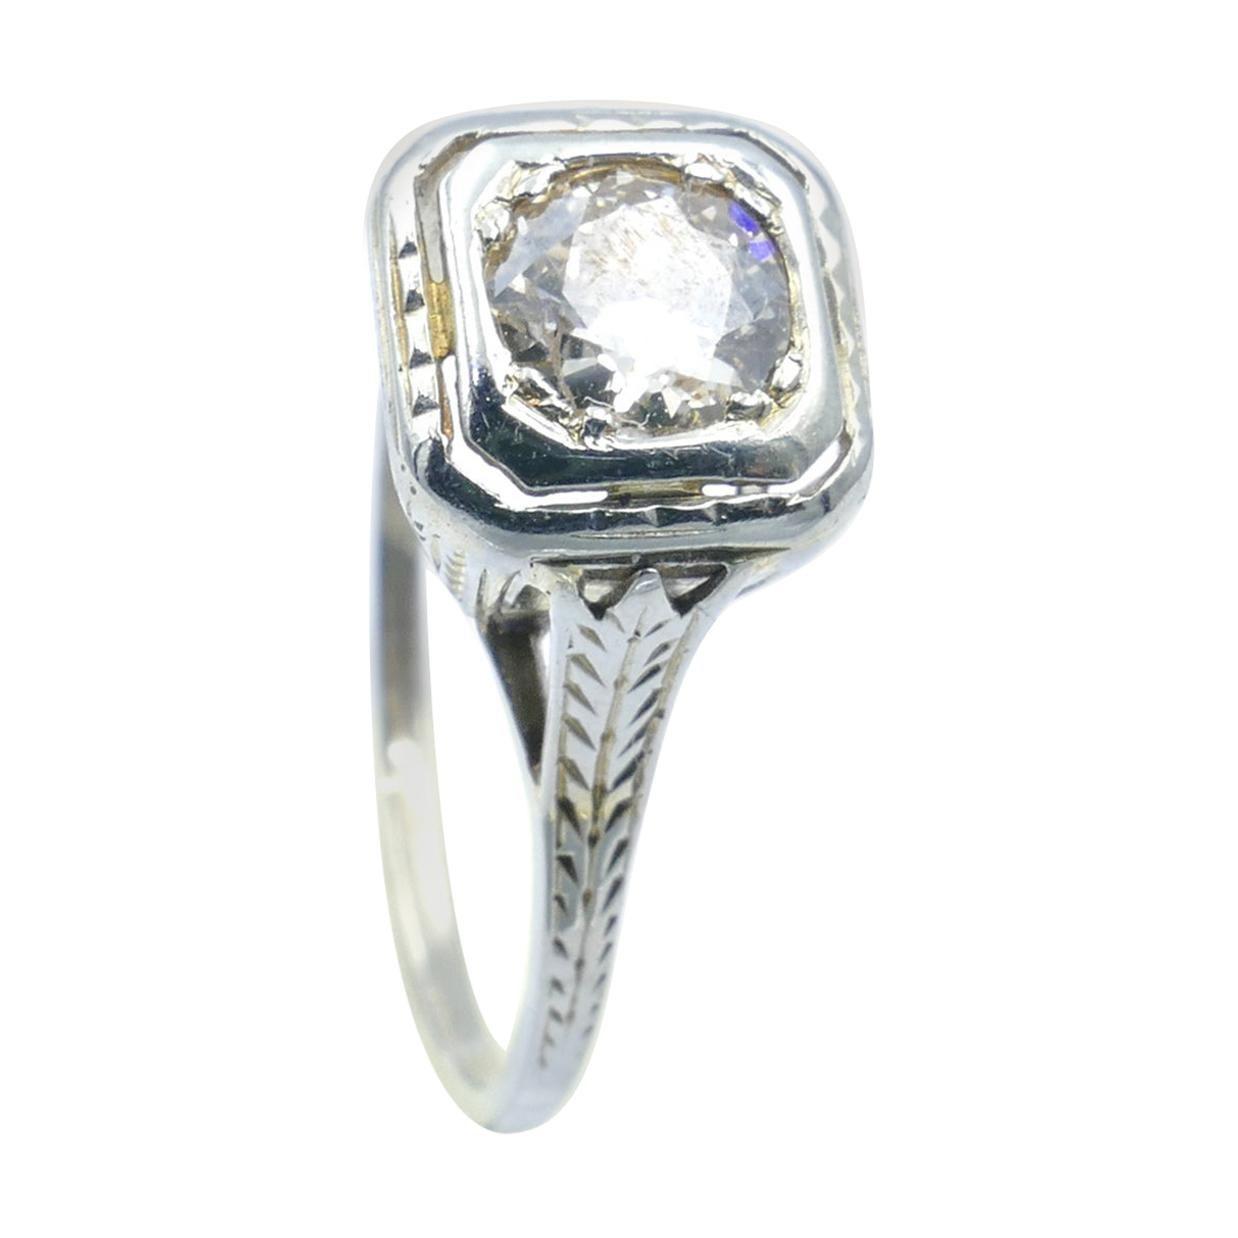 Art Deco 18ct White Gold Solitaire Old European Cut Diamond Ring, Circa 1925